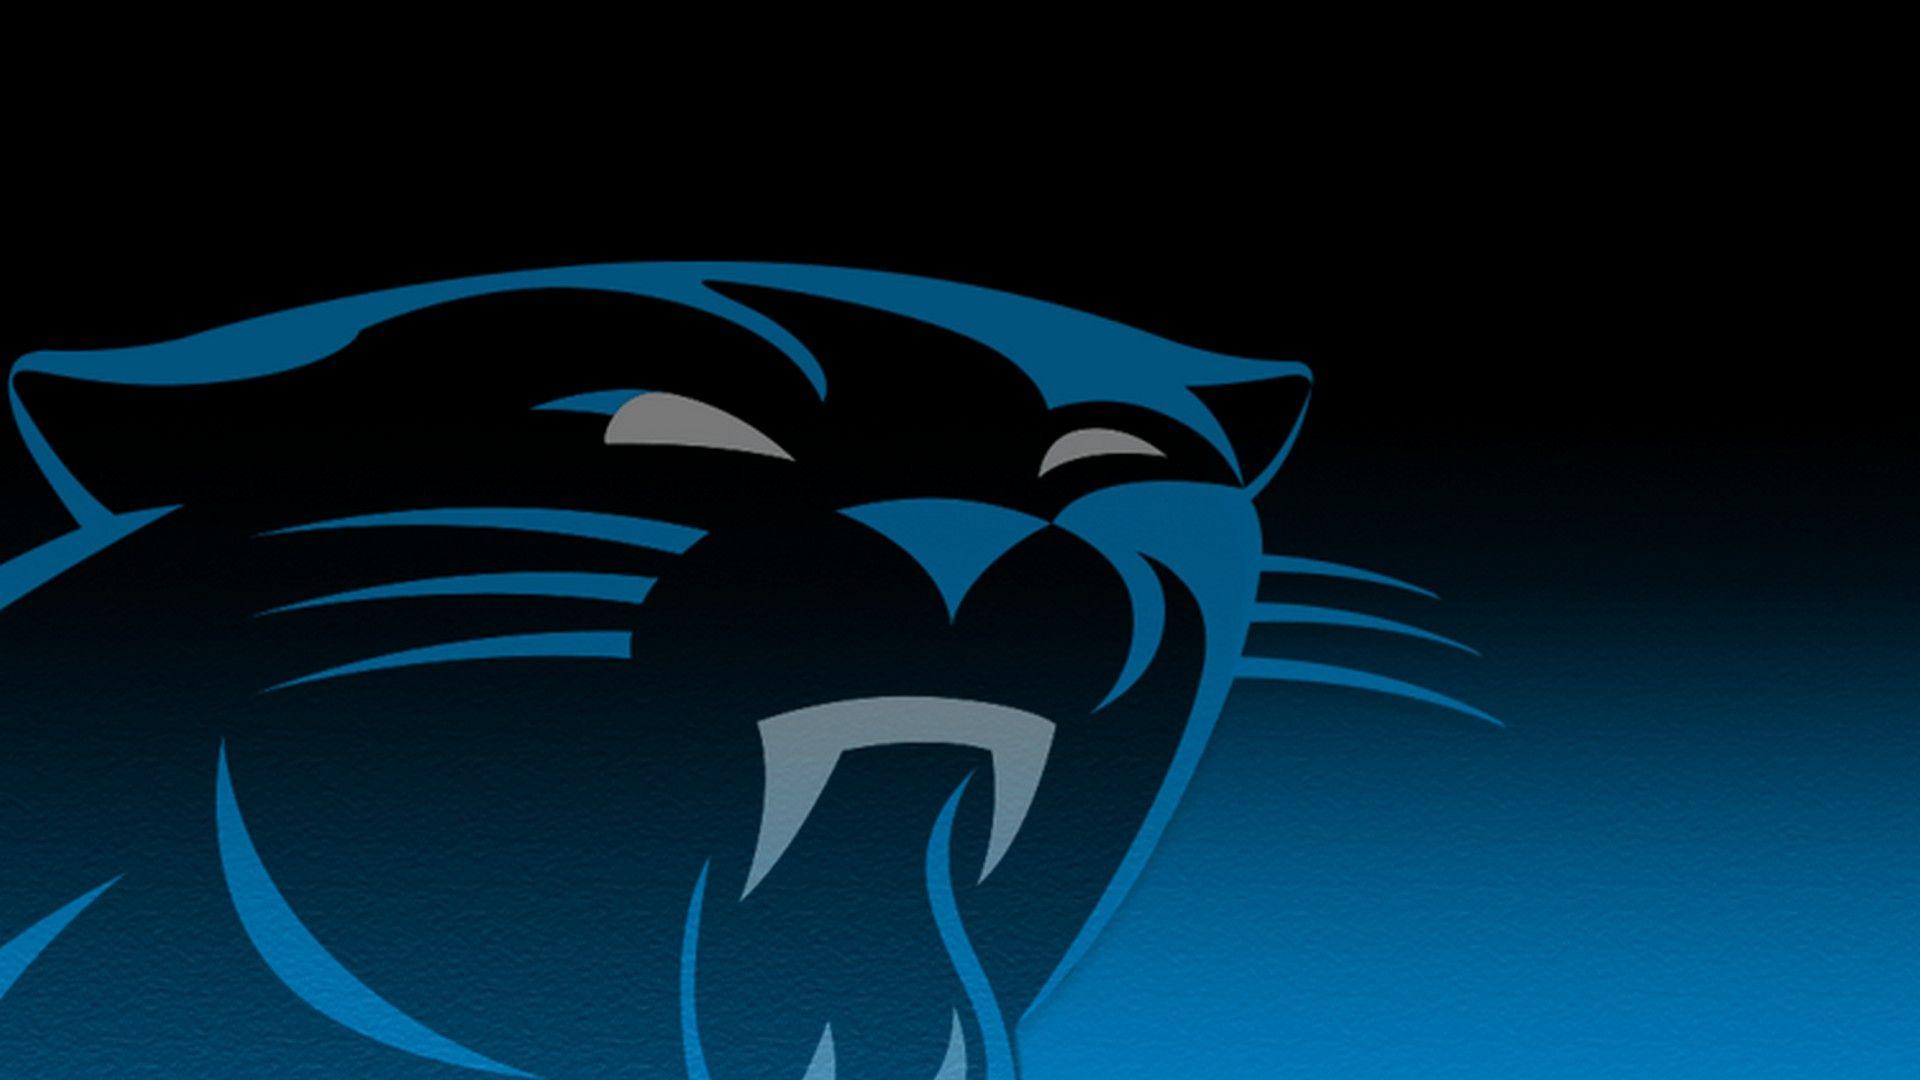 Carolina Panthers Wallpaper For Mac Backgrounds 2021 Nfl Football Wallpapers Carolina Panthers Wallpaper Nfl Football Wallpaper Panthers